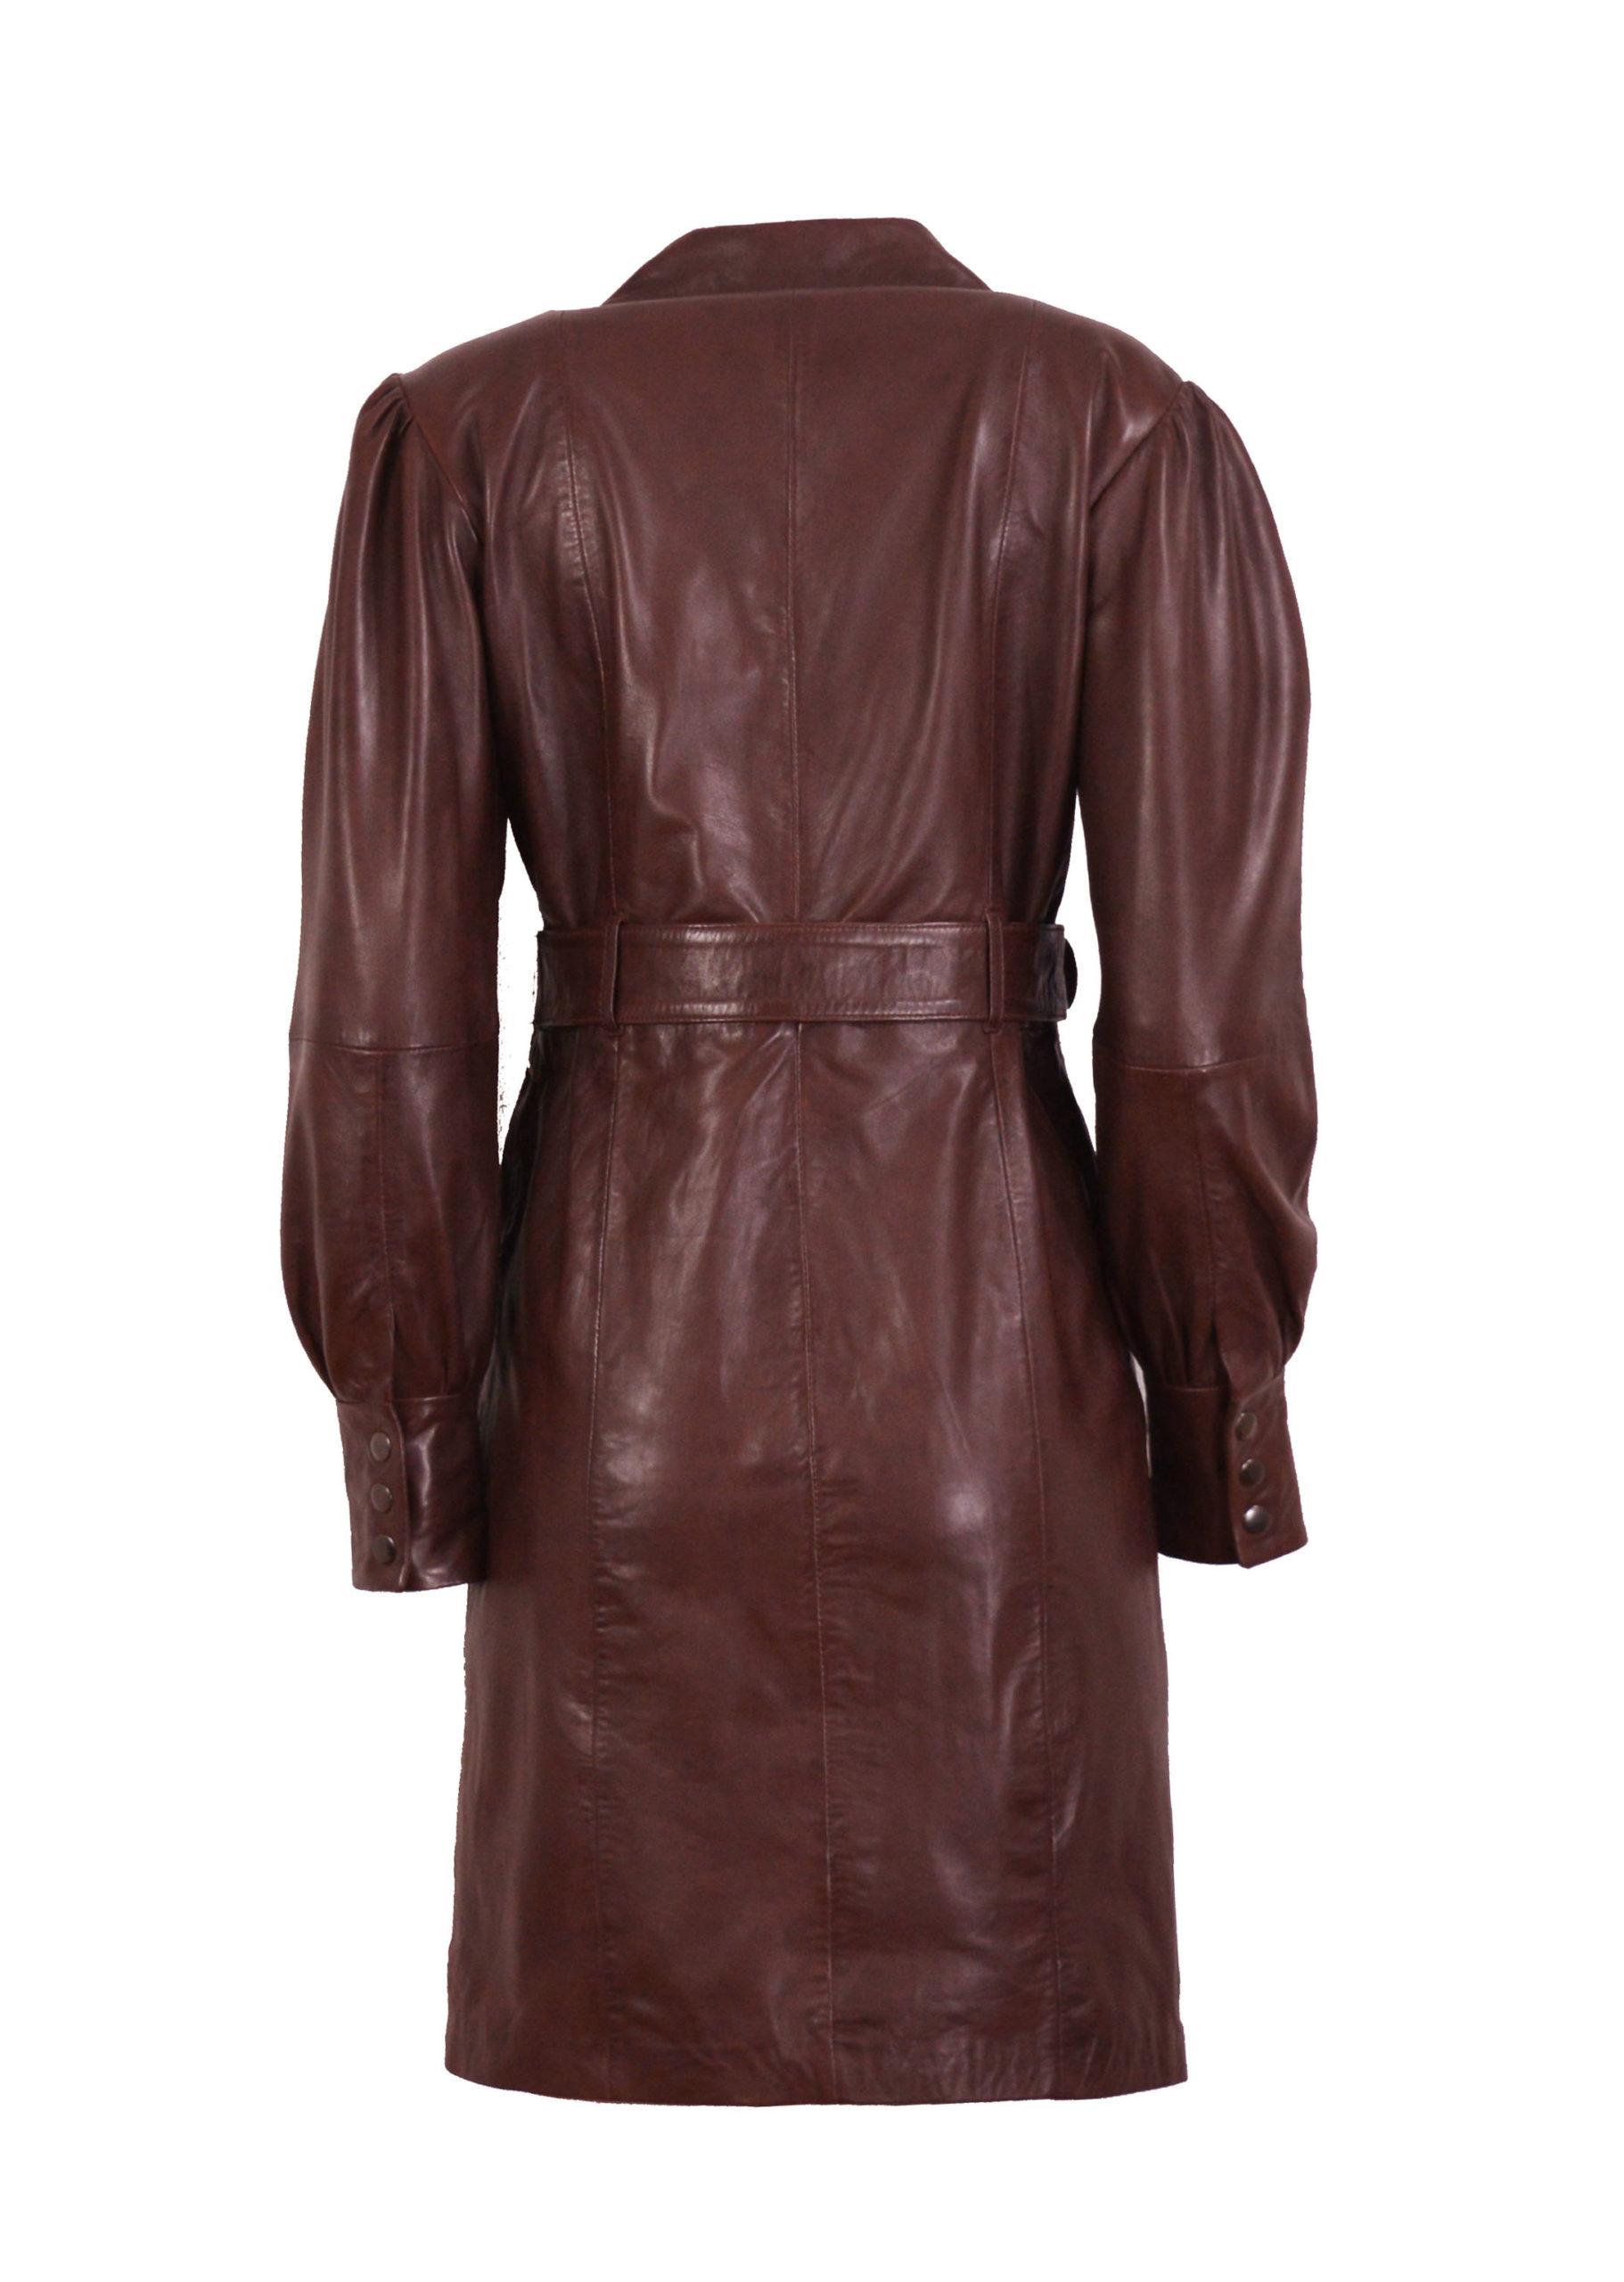 Zoef Leather Jurk Monica Aubergine 2